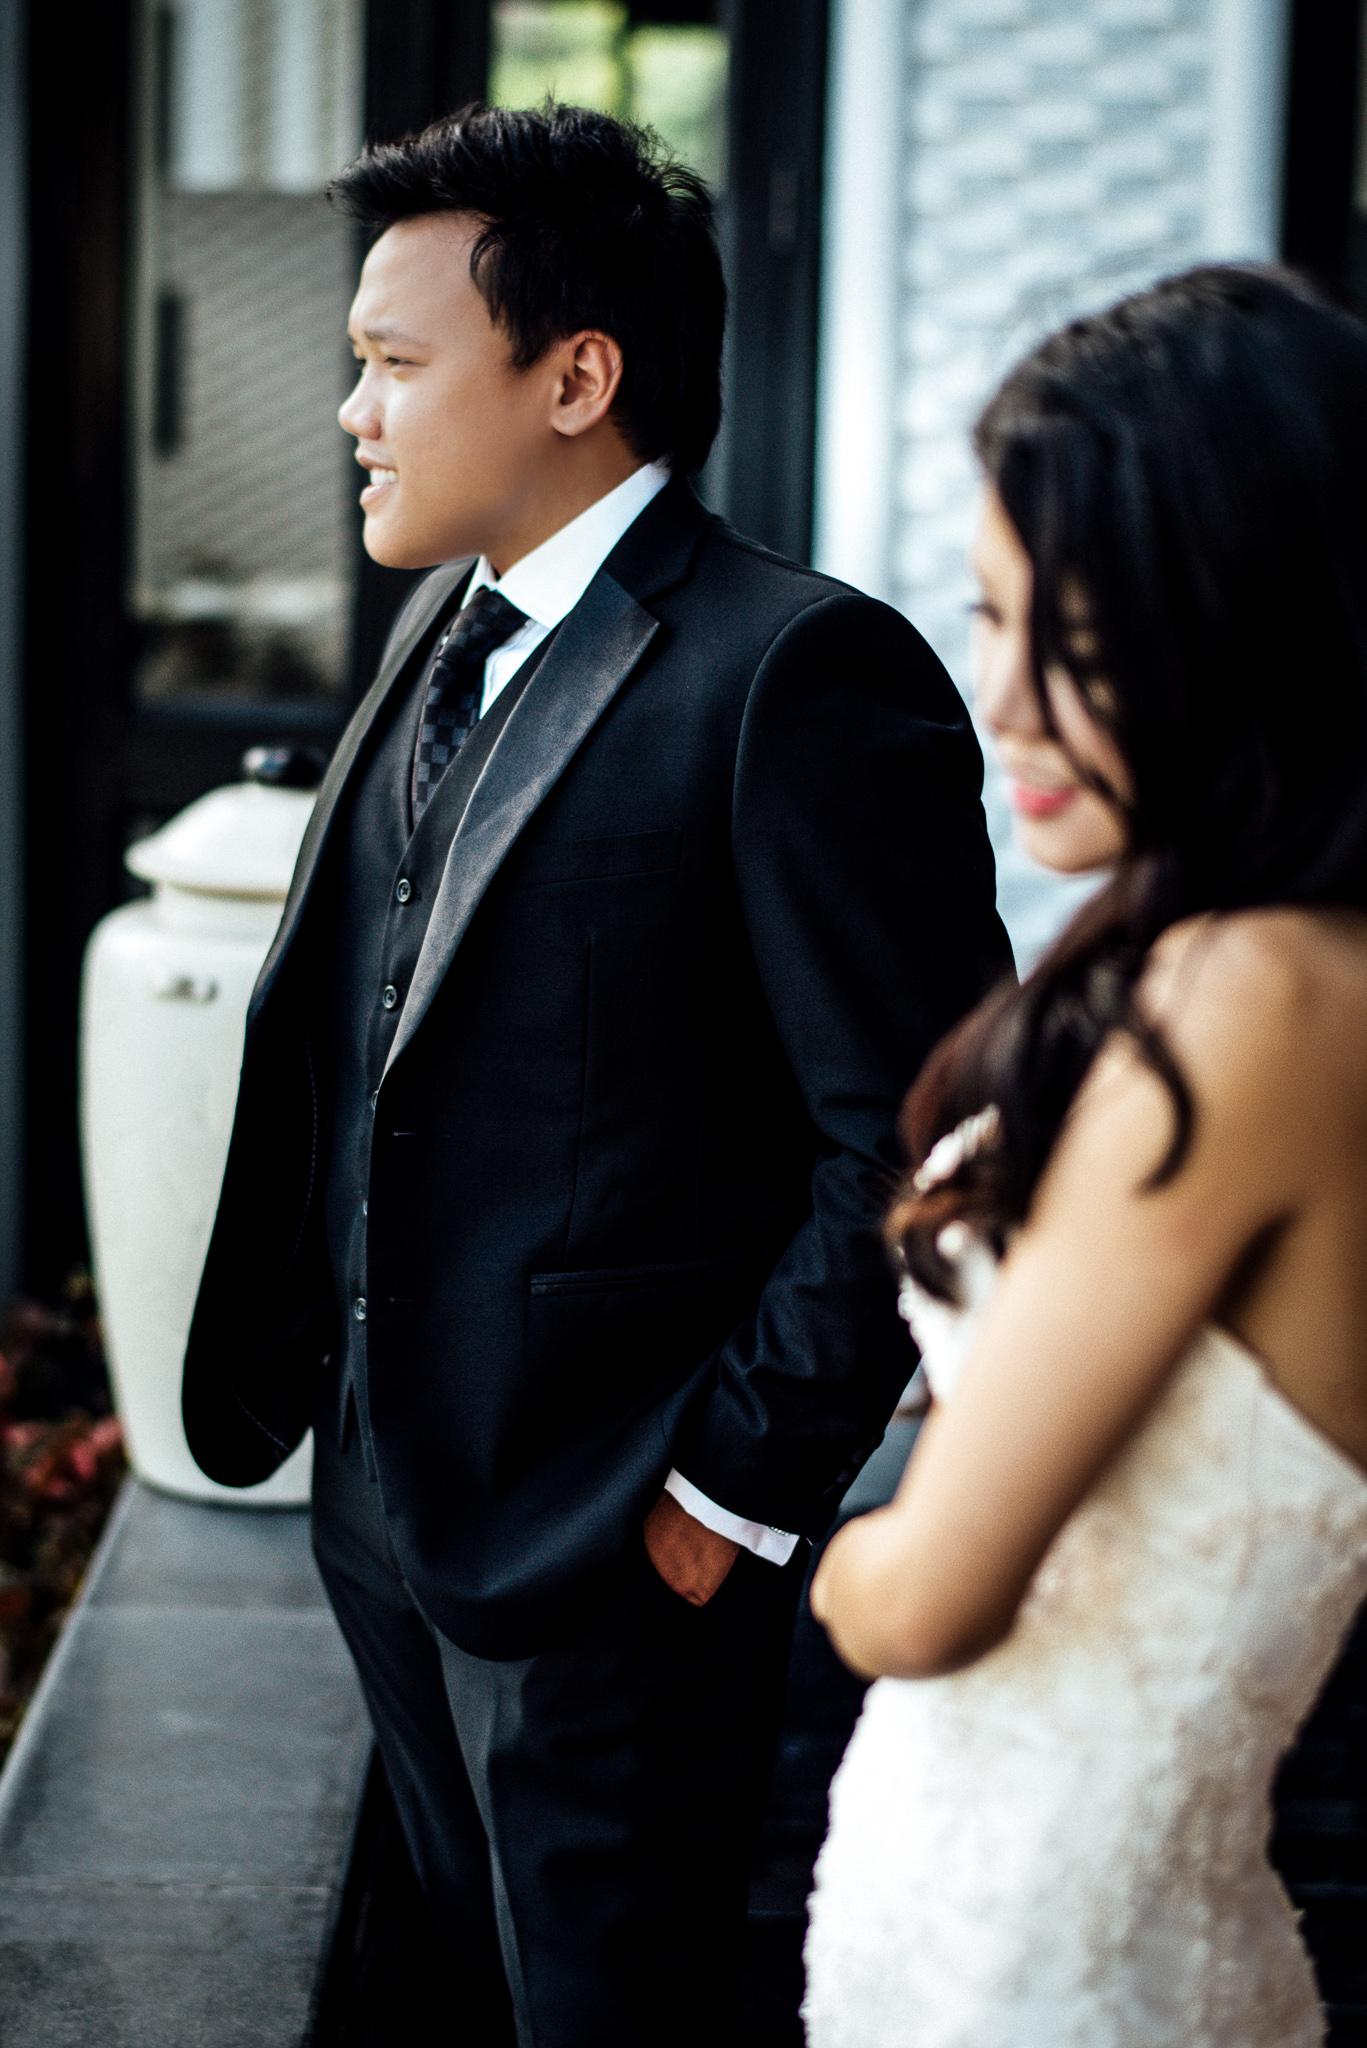 Phu - Trang prewedding (83 of 1392)-Edit.jpg